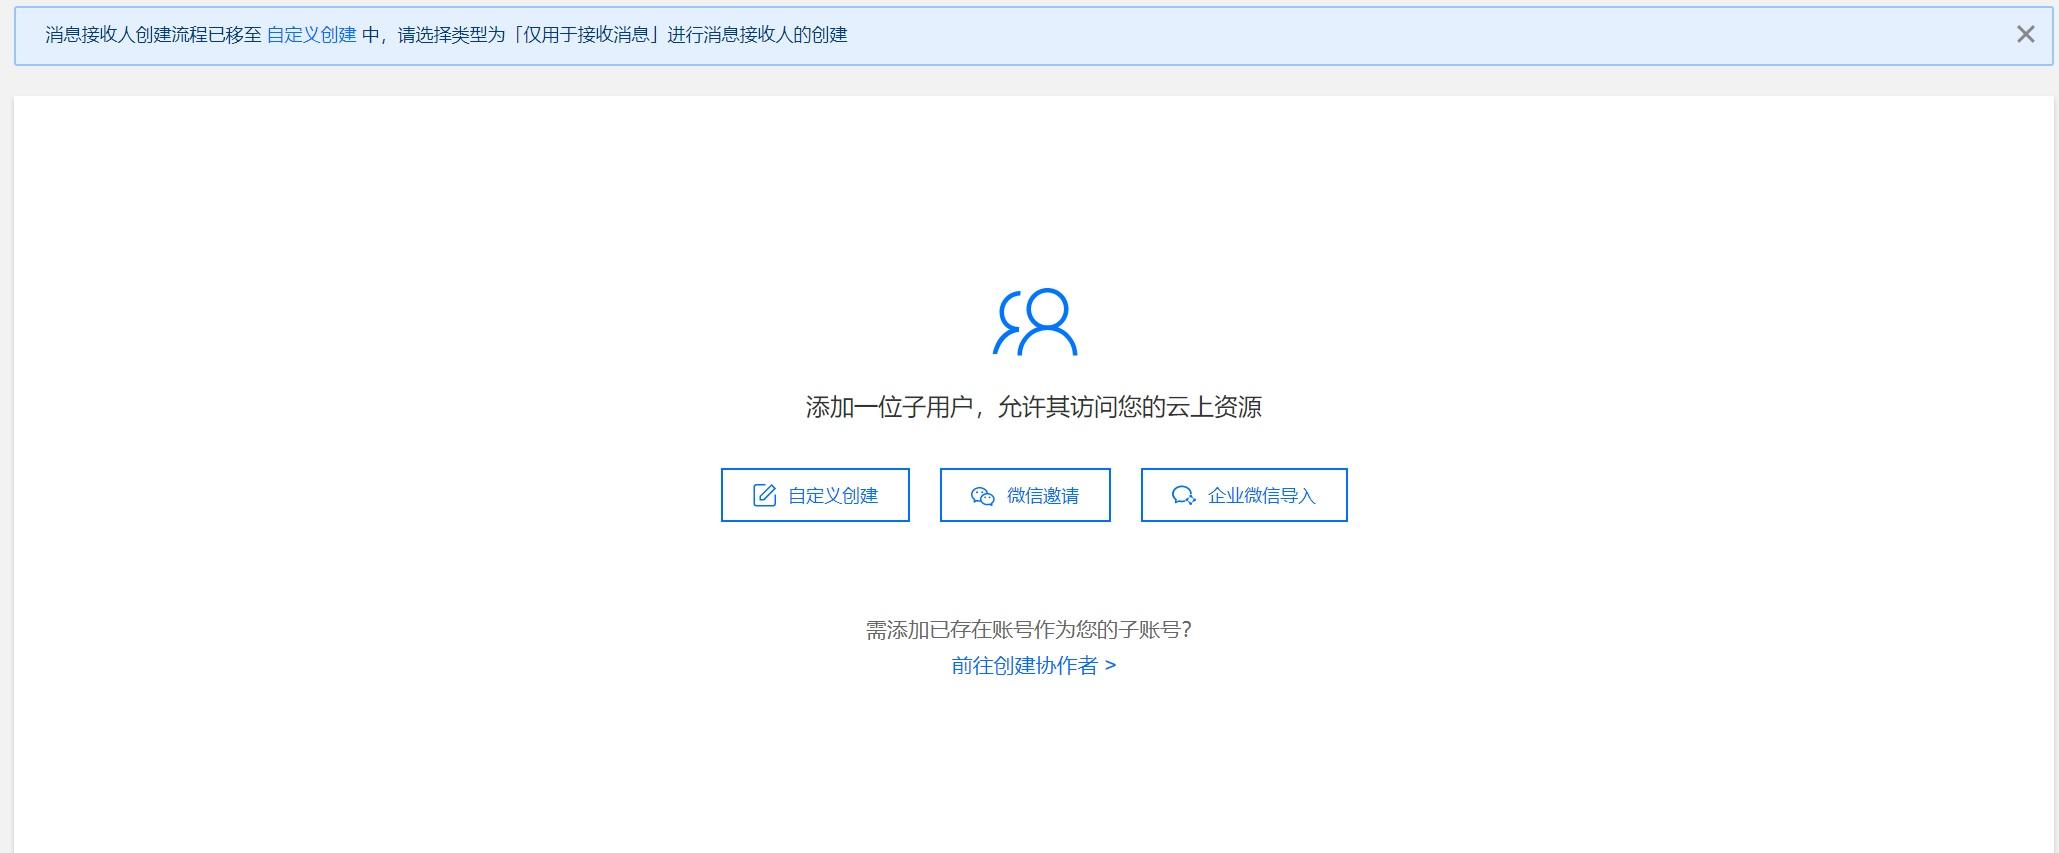 2_create sub user.jpg